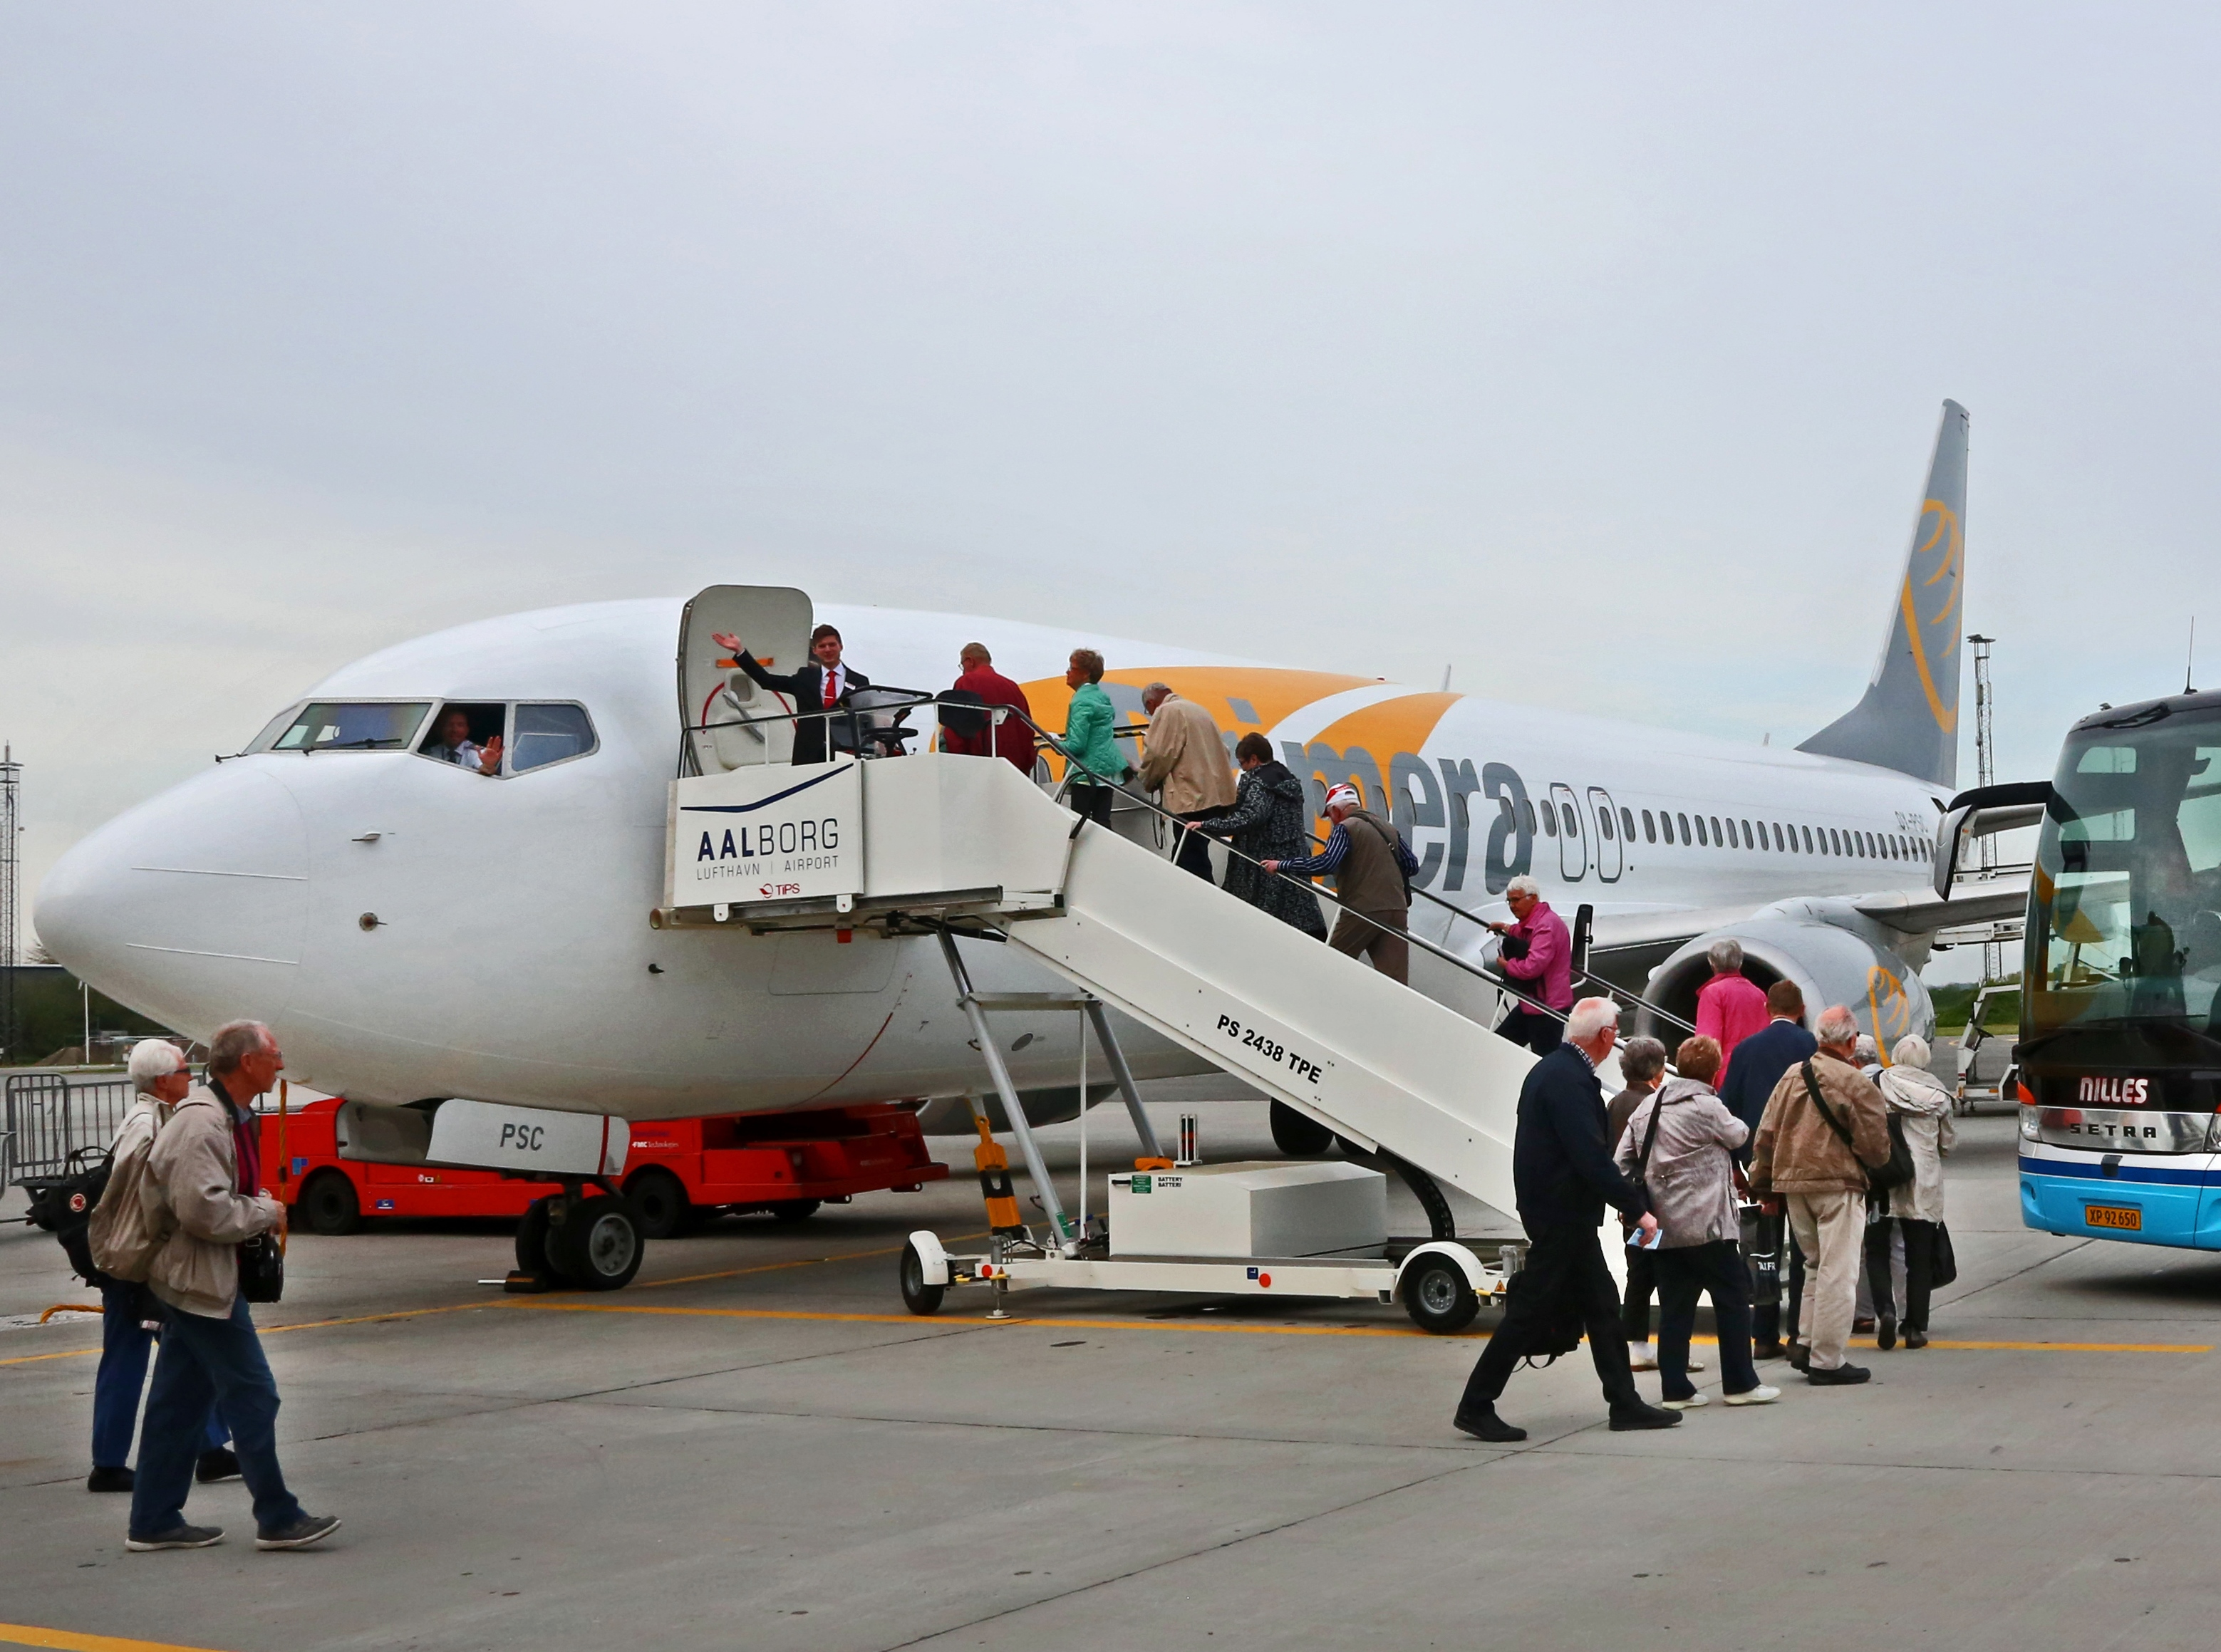 Fly fra Primera Air i Aalborg Lufthavn, pressefoto.